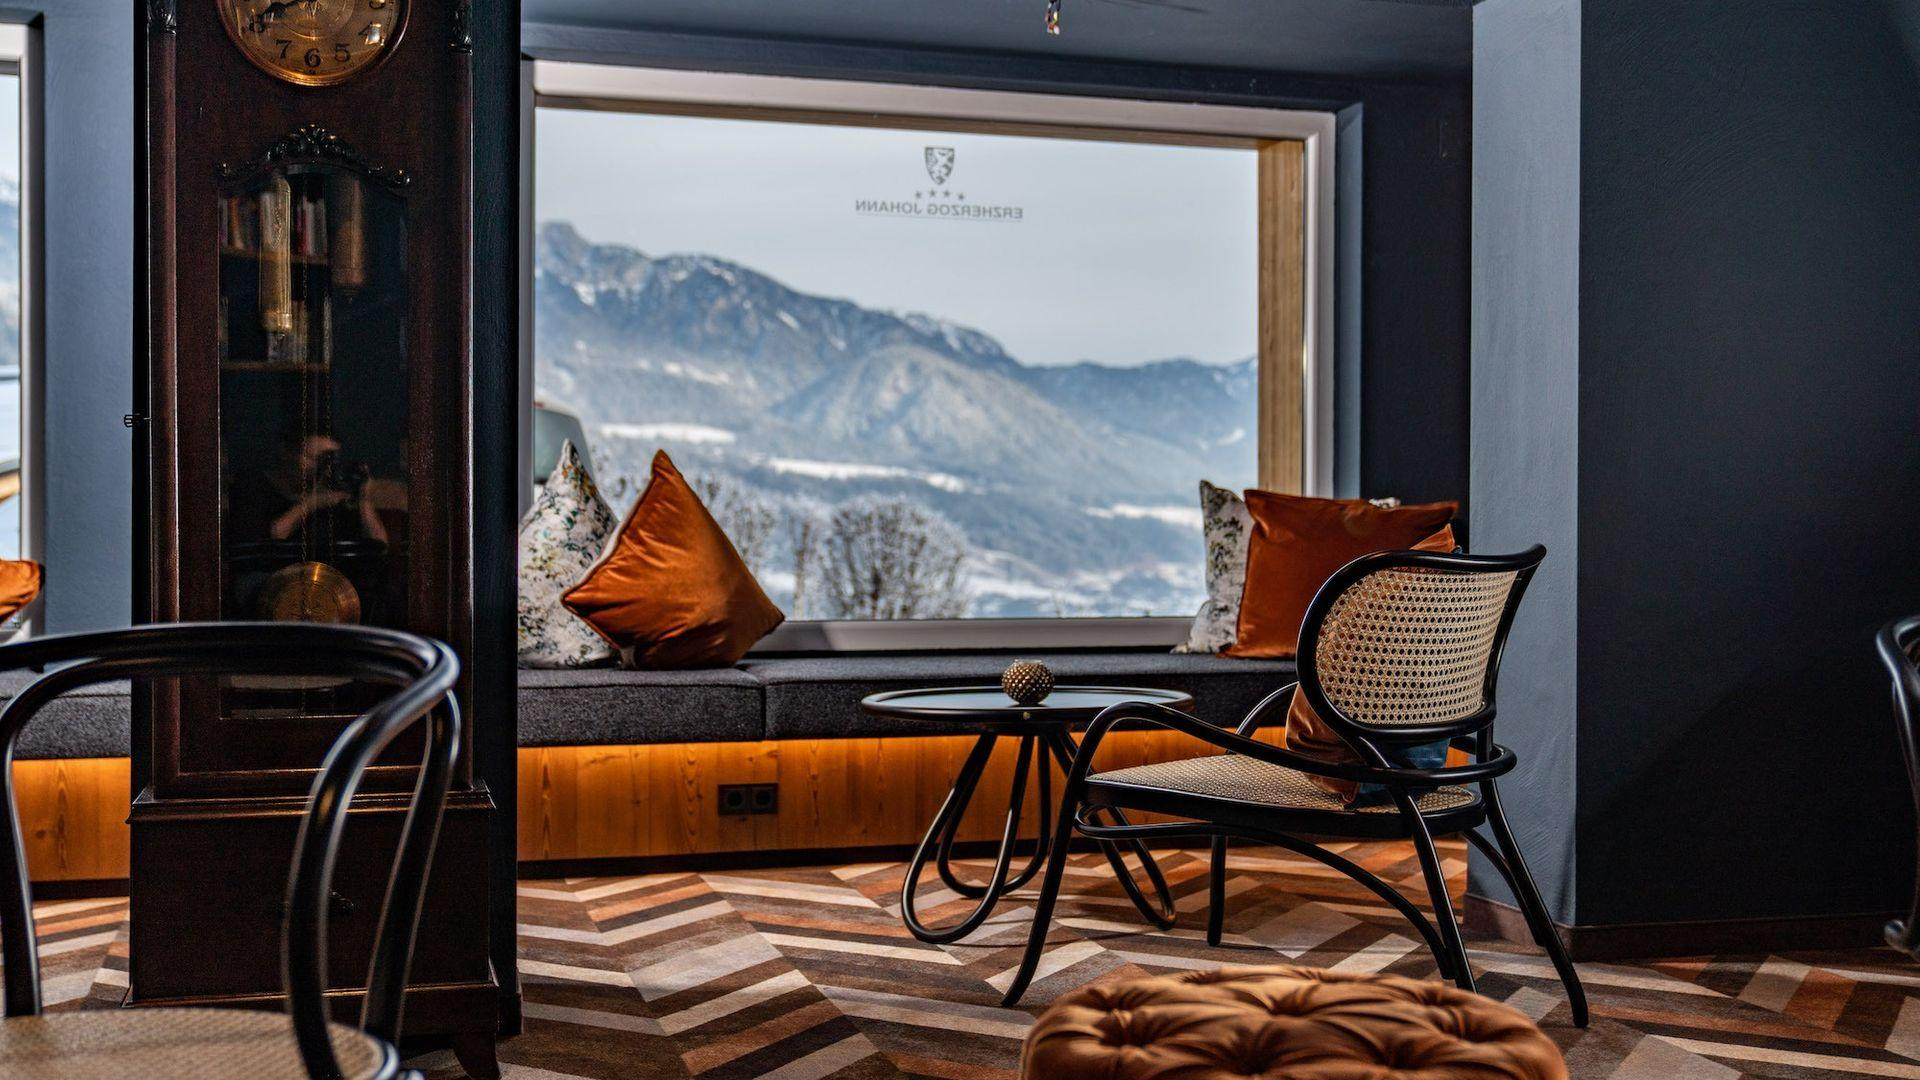 Erzherzog Johann Alpin Style Hotel Schladming